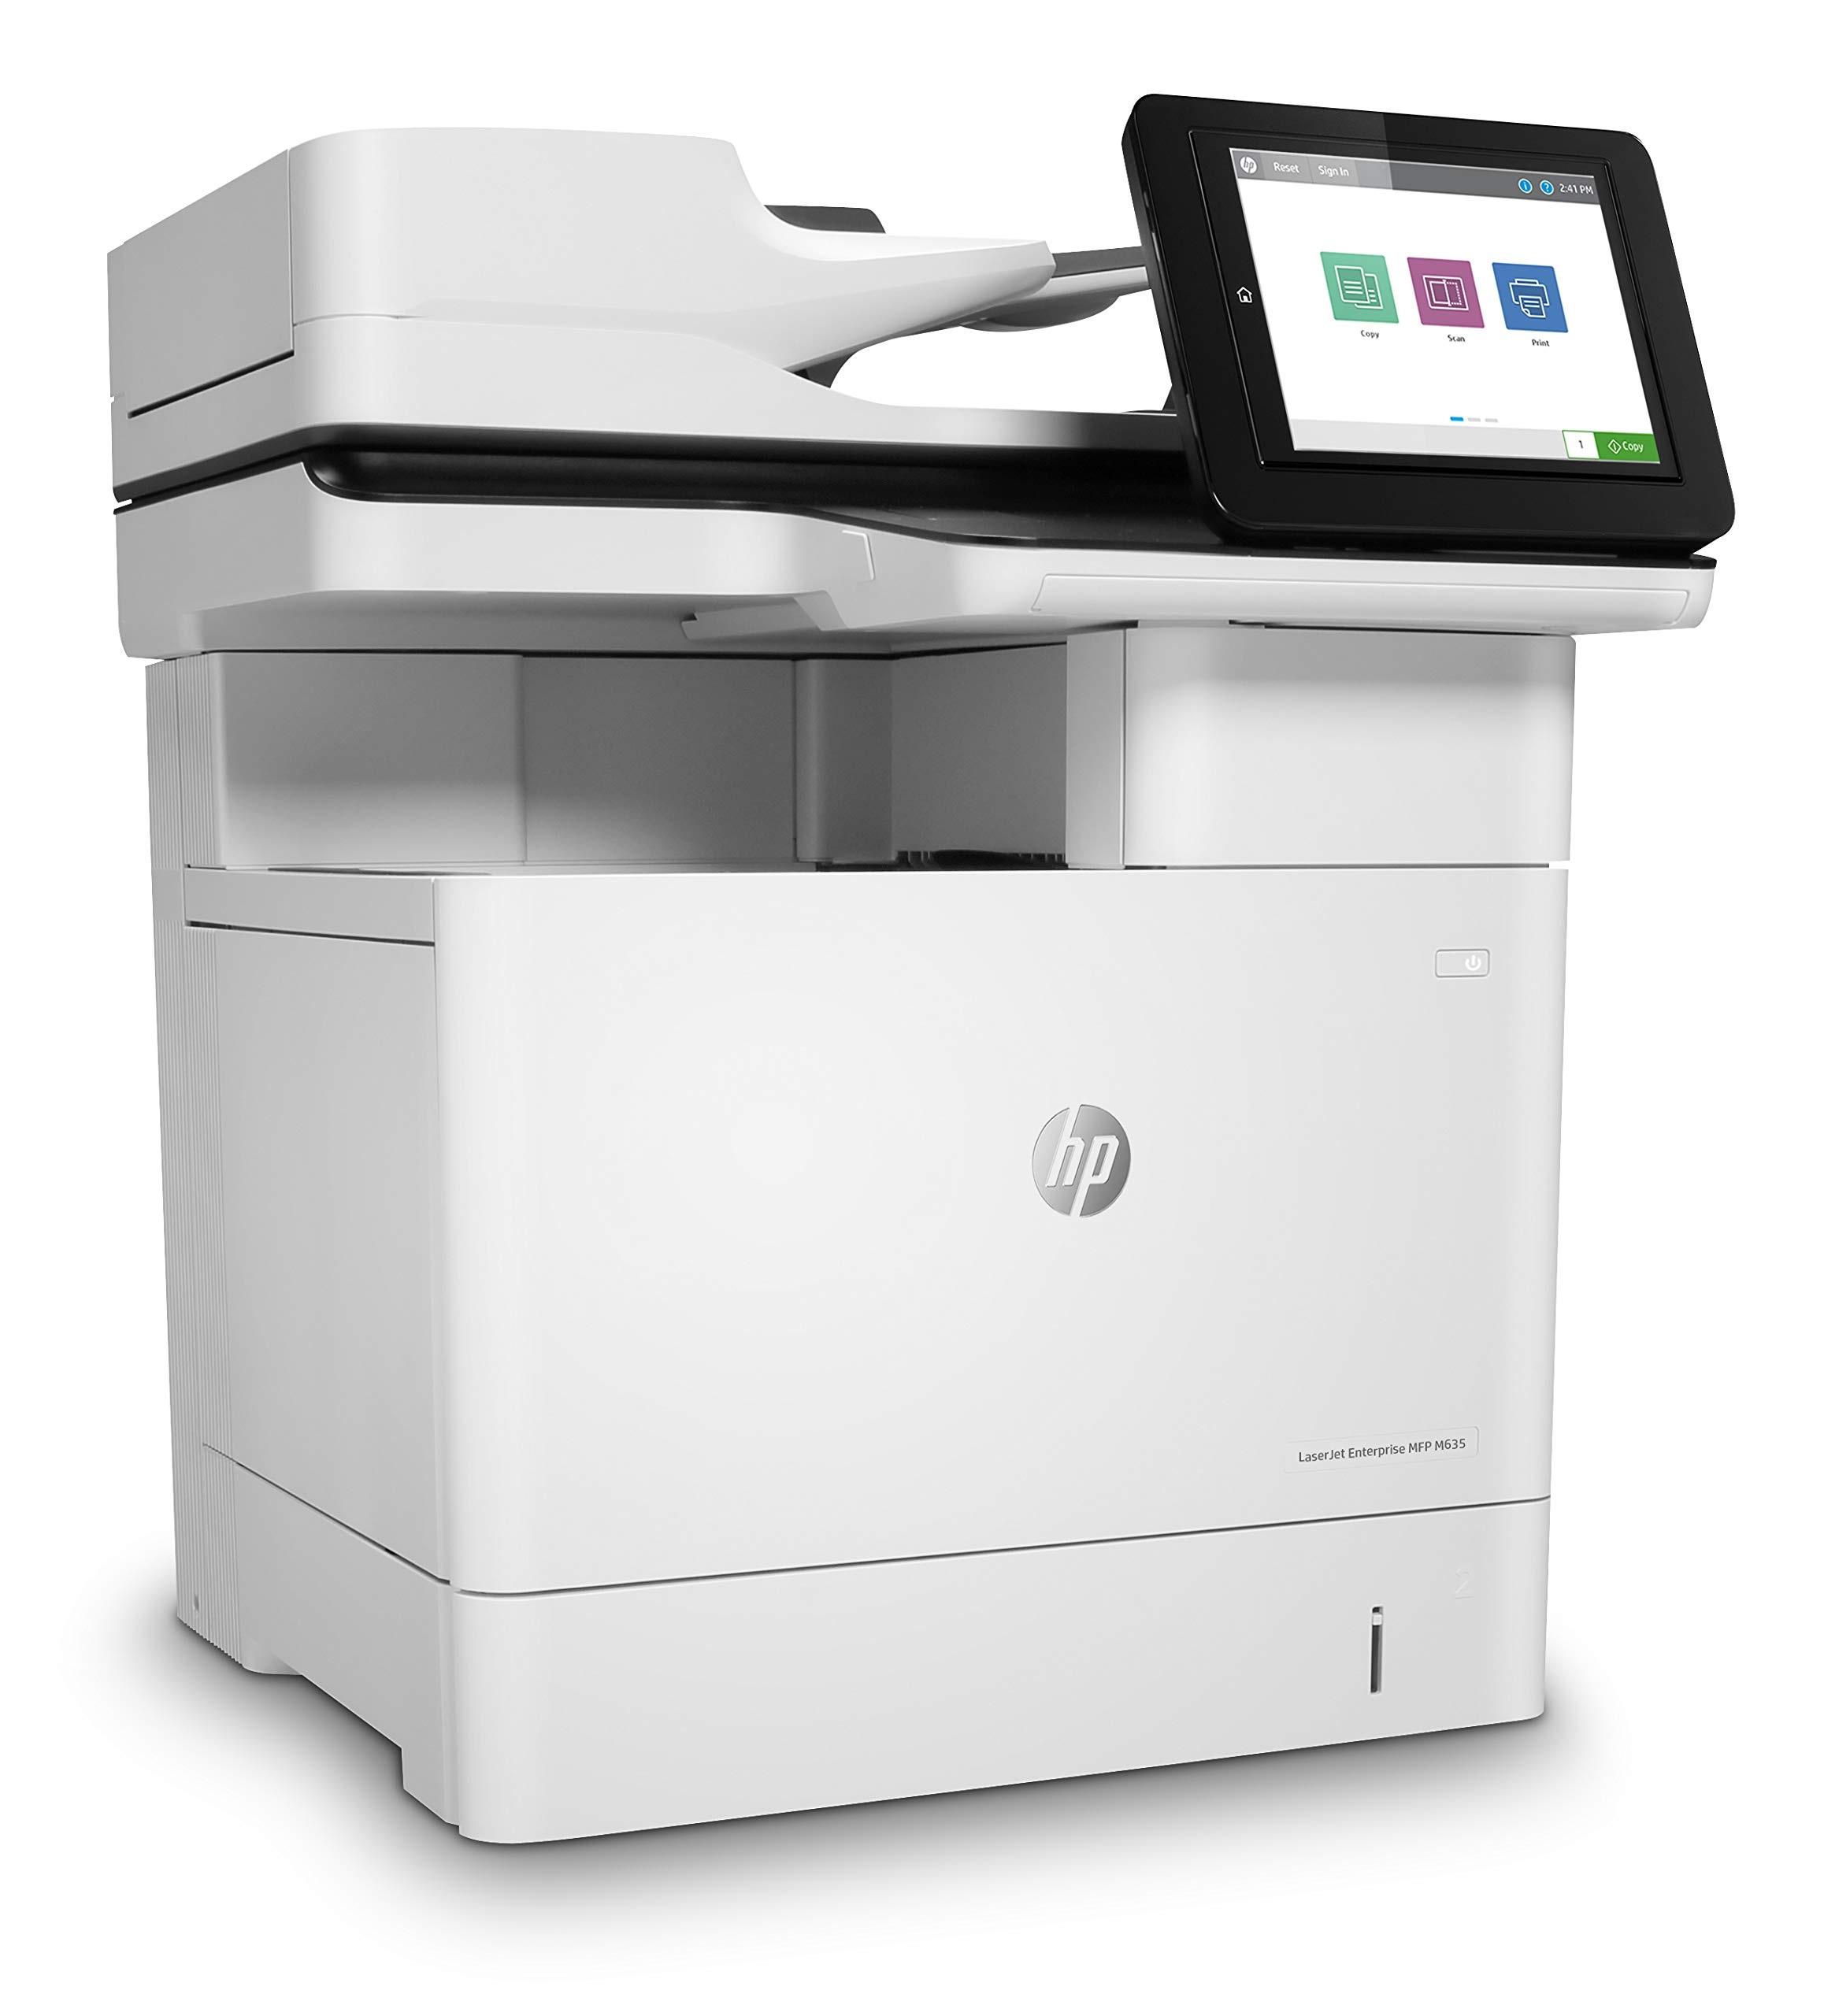 HP LaserJet Enterprise MFP M635